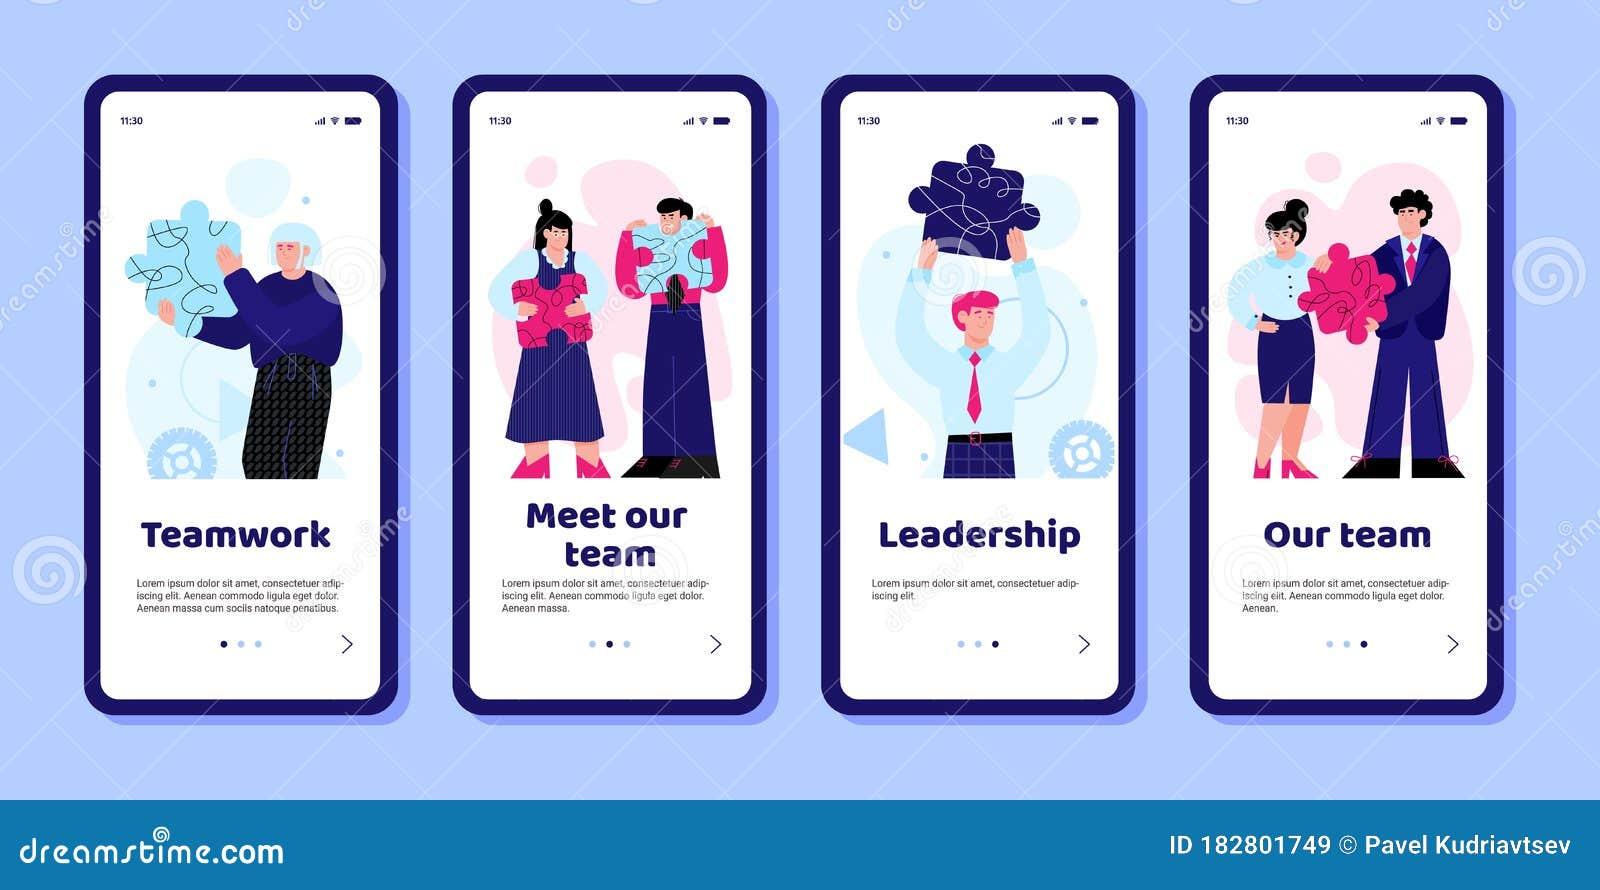 Business Team App Set On Phone Screens Teamwork And Leadership Mobile Stock Vector Illustration Of Screen Leadership 182801749